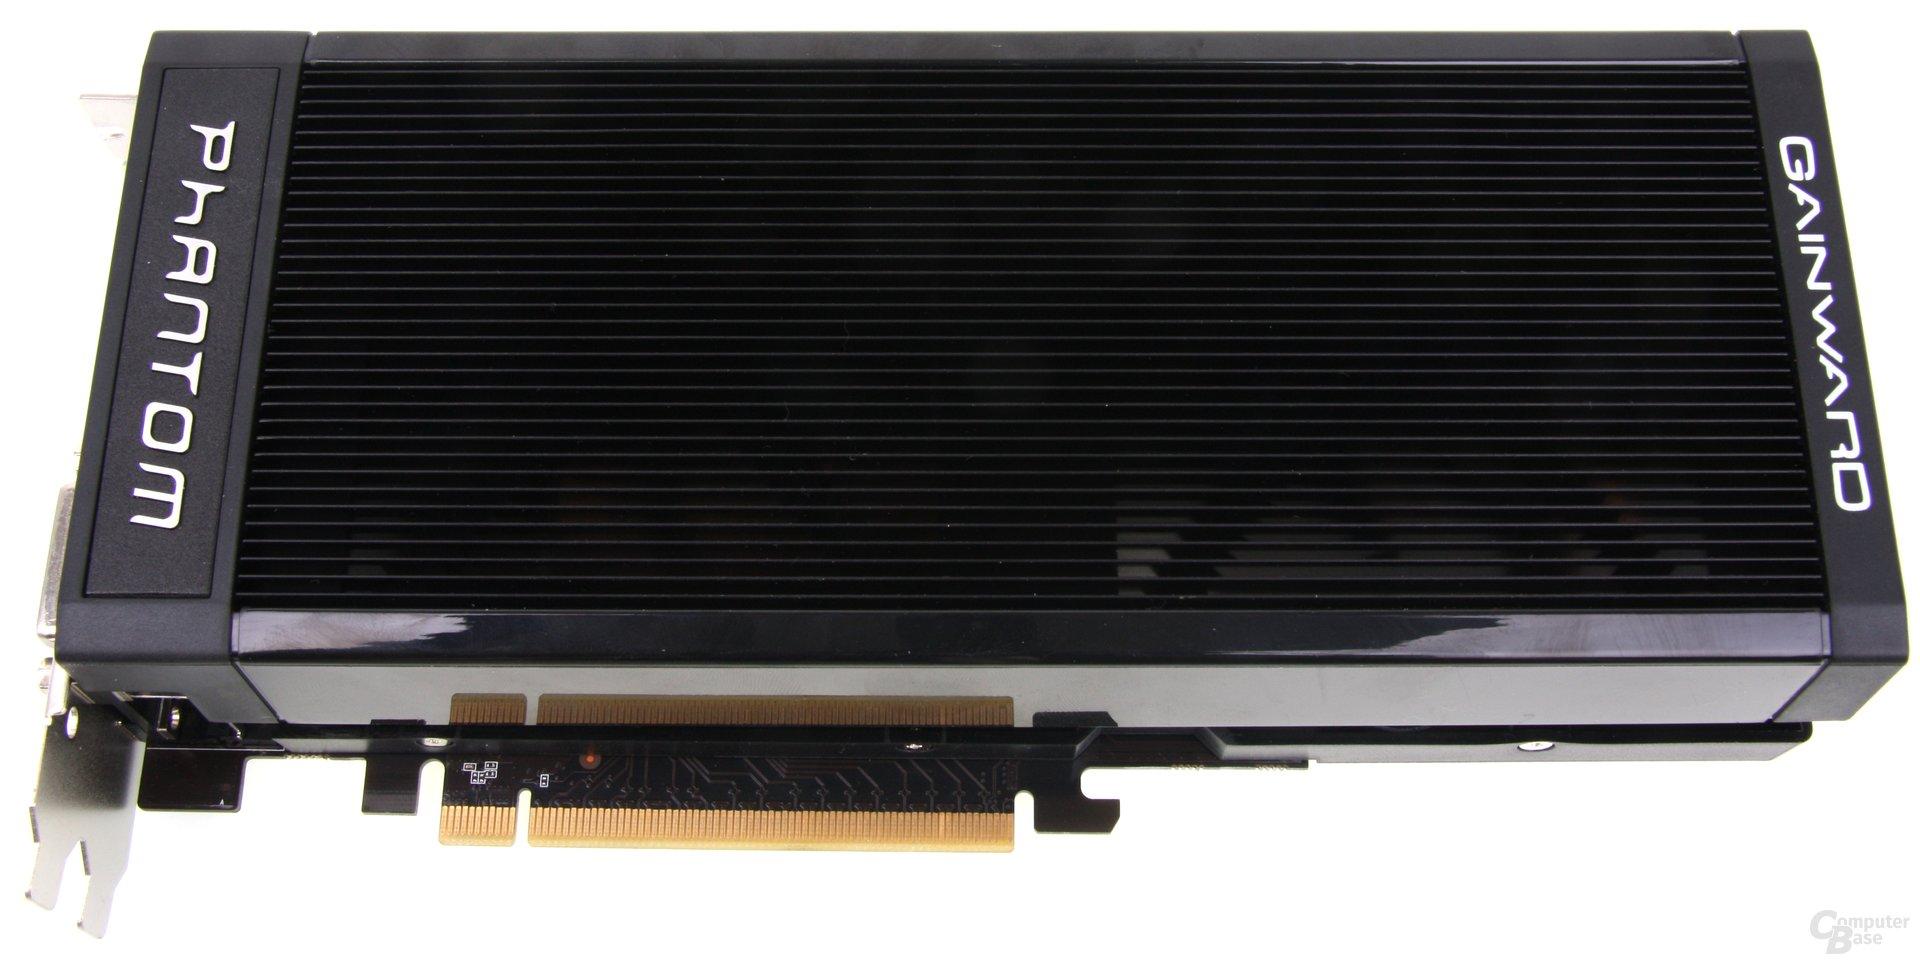 GeForce GTX 660 Phantom